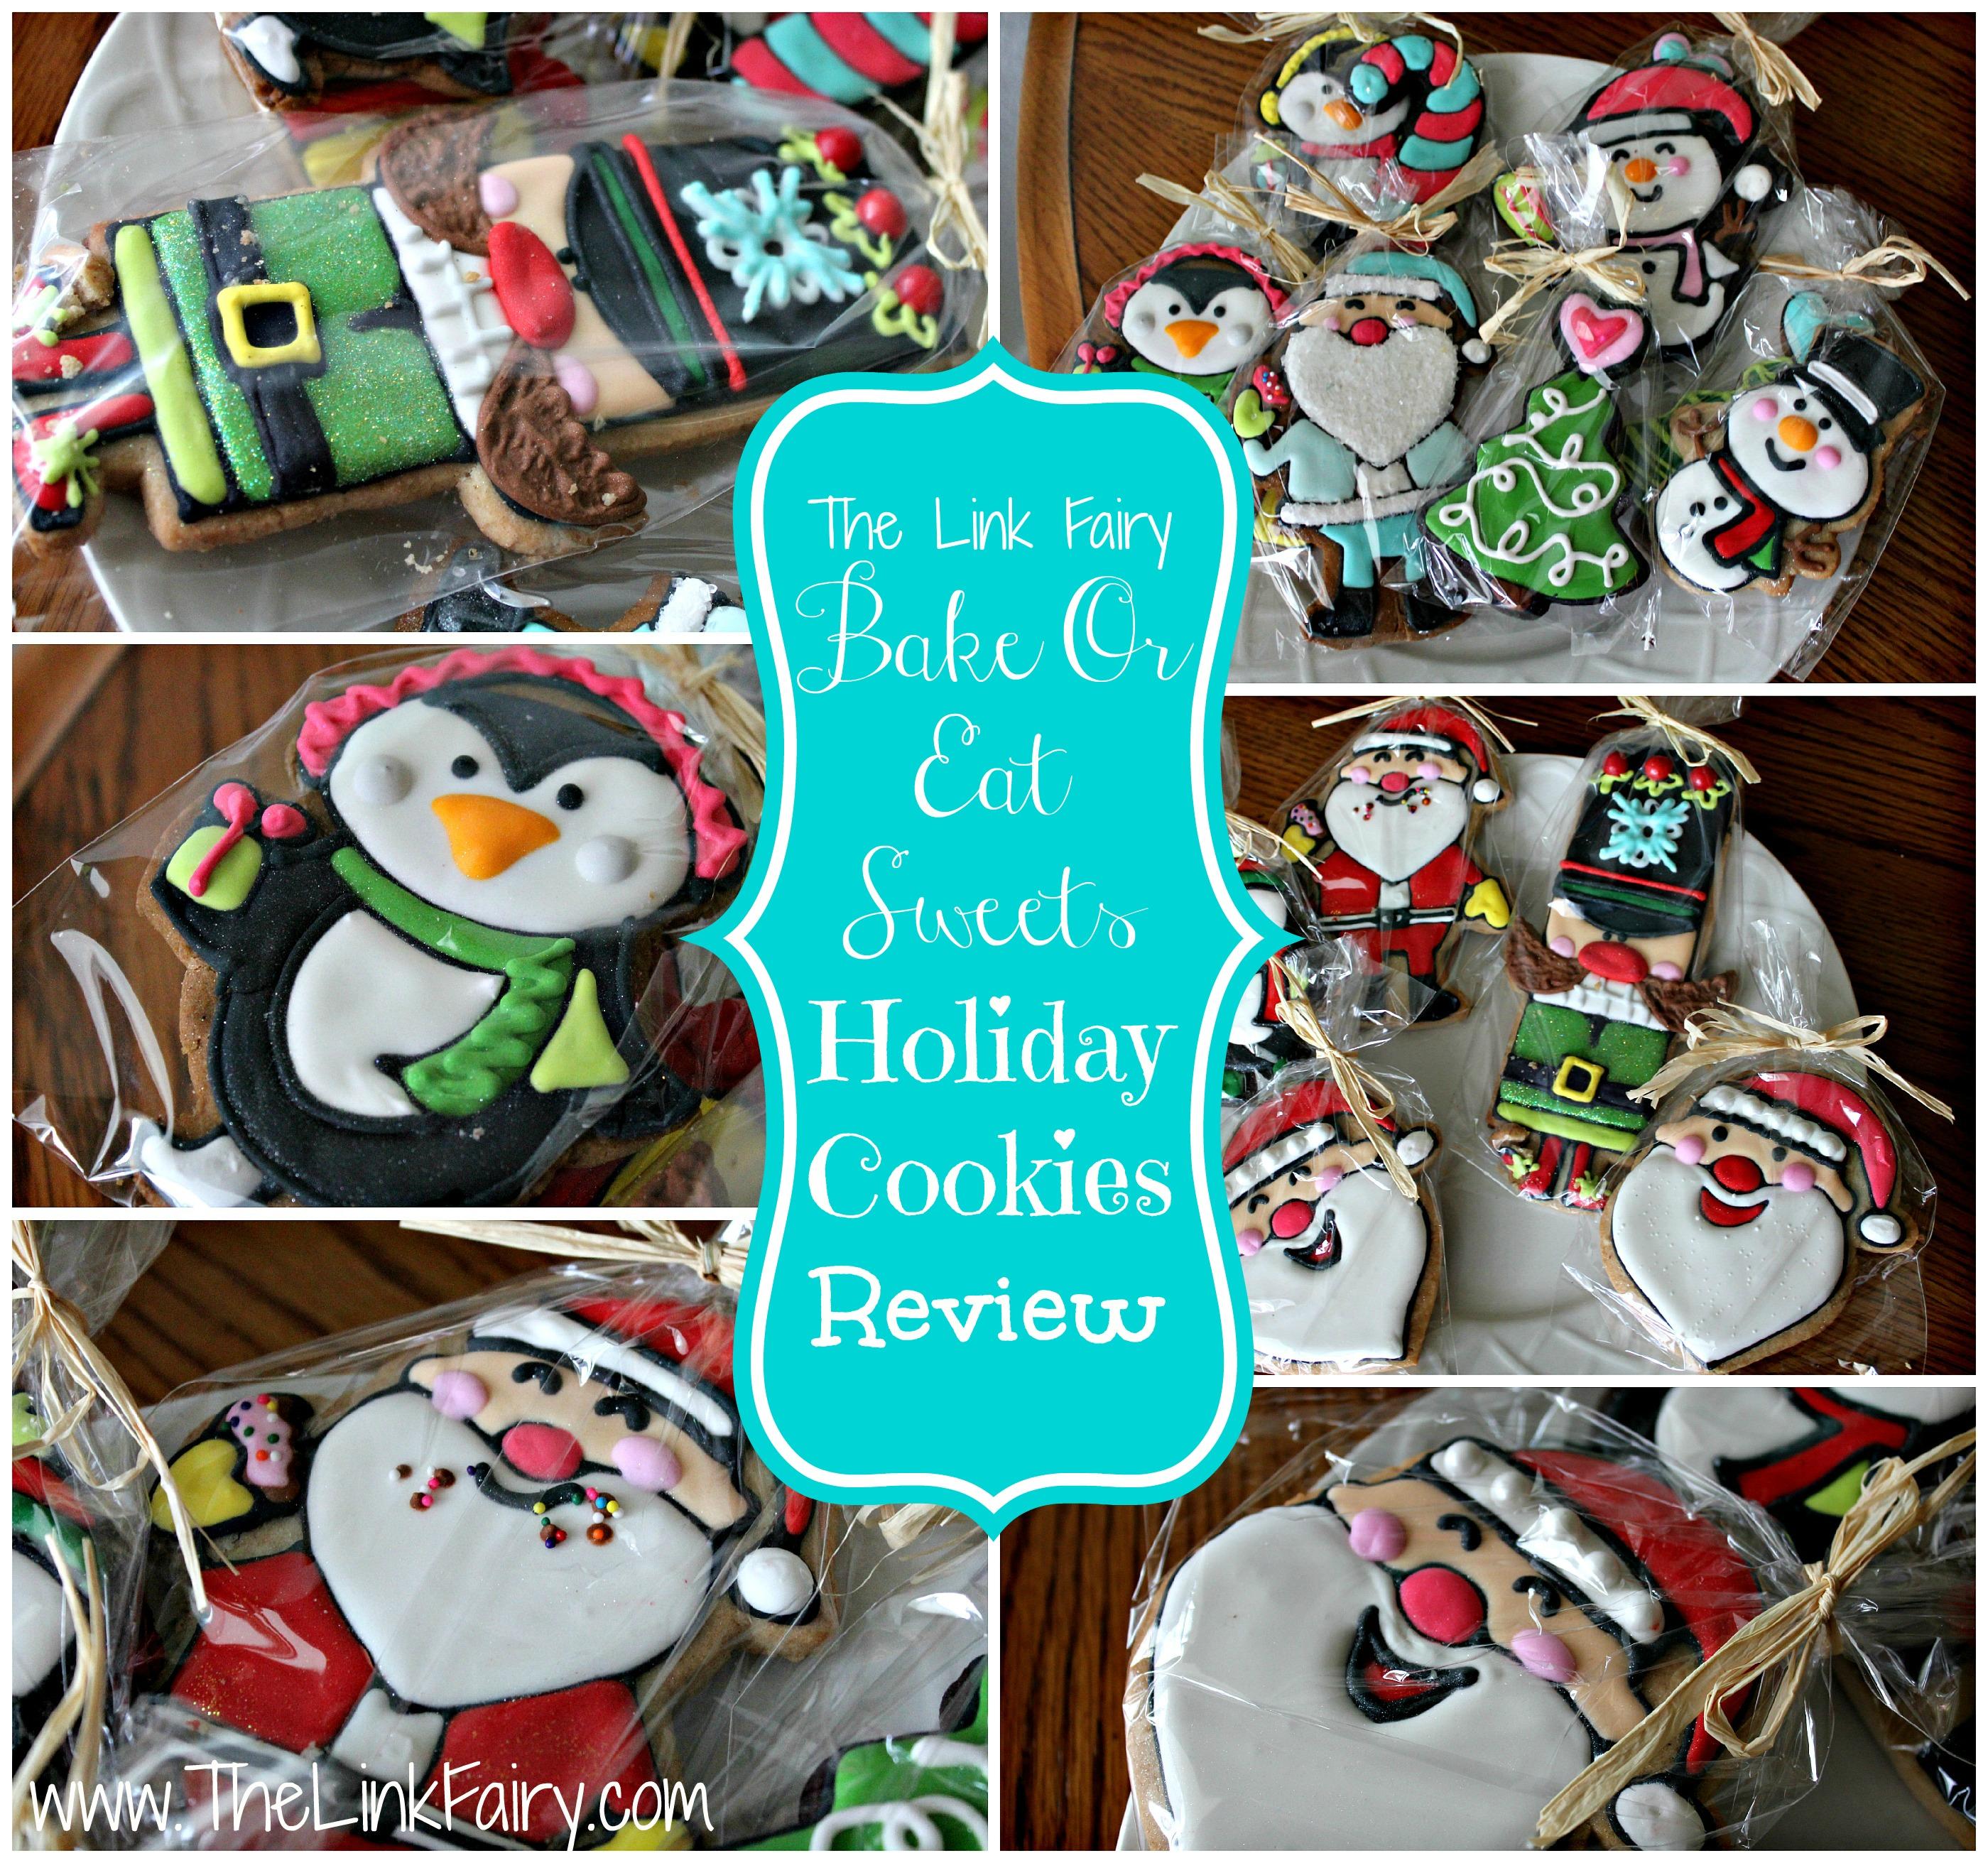 Bake Or Eat Sweets Custom Christmas Cookies 2 Jet Setting Mom